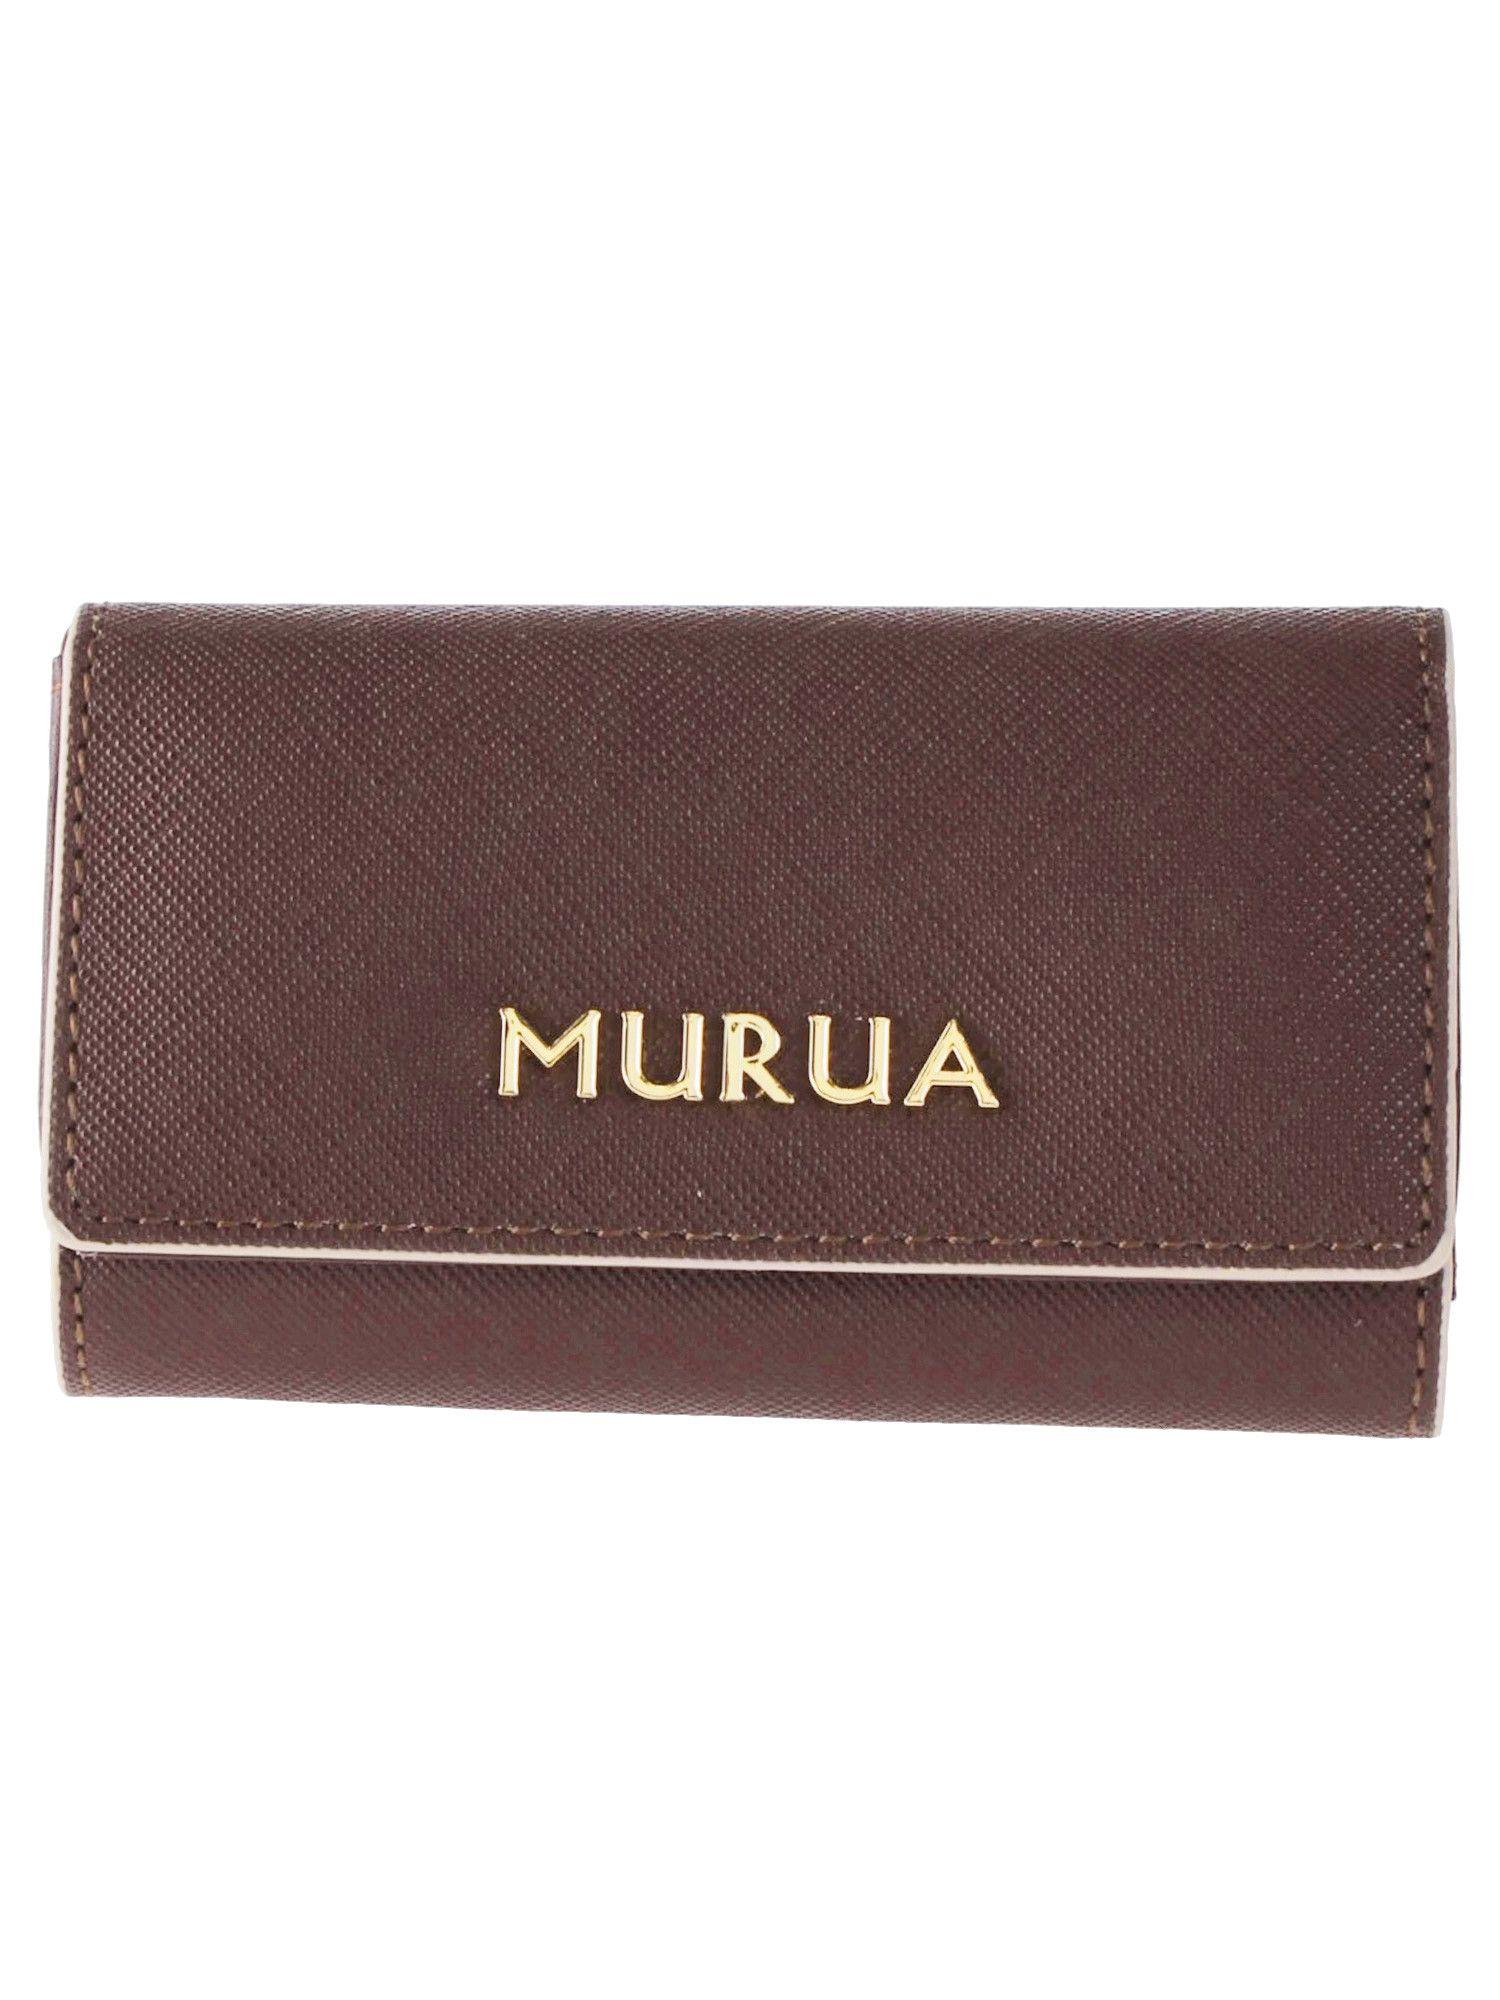 【MURUA】配色キーケース